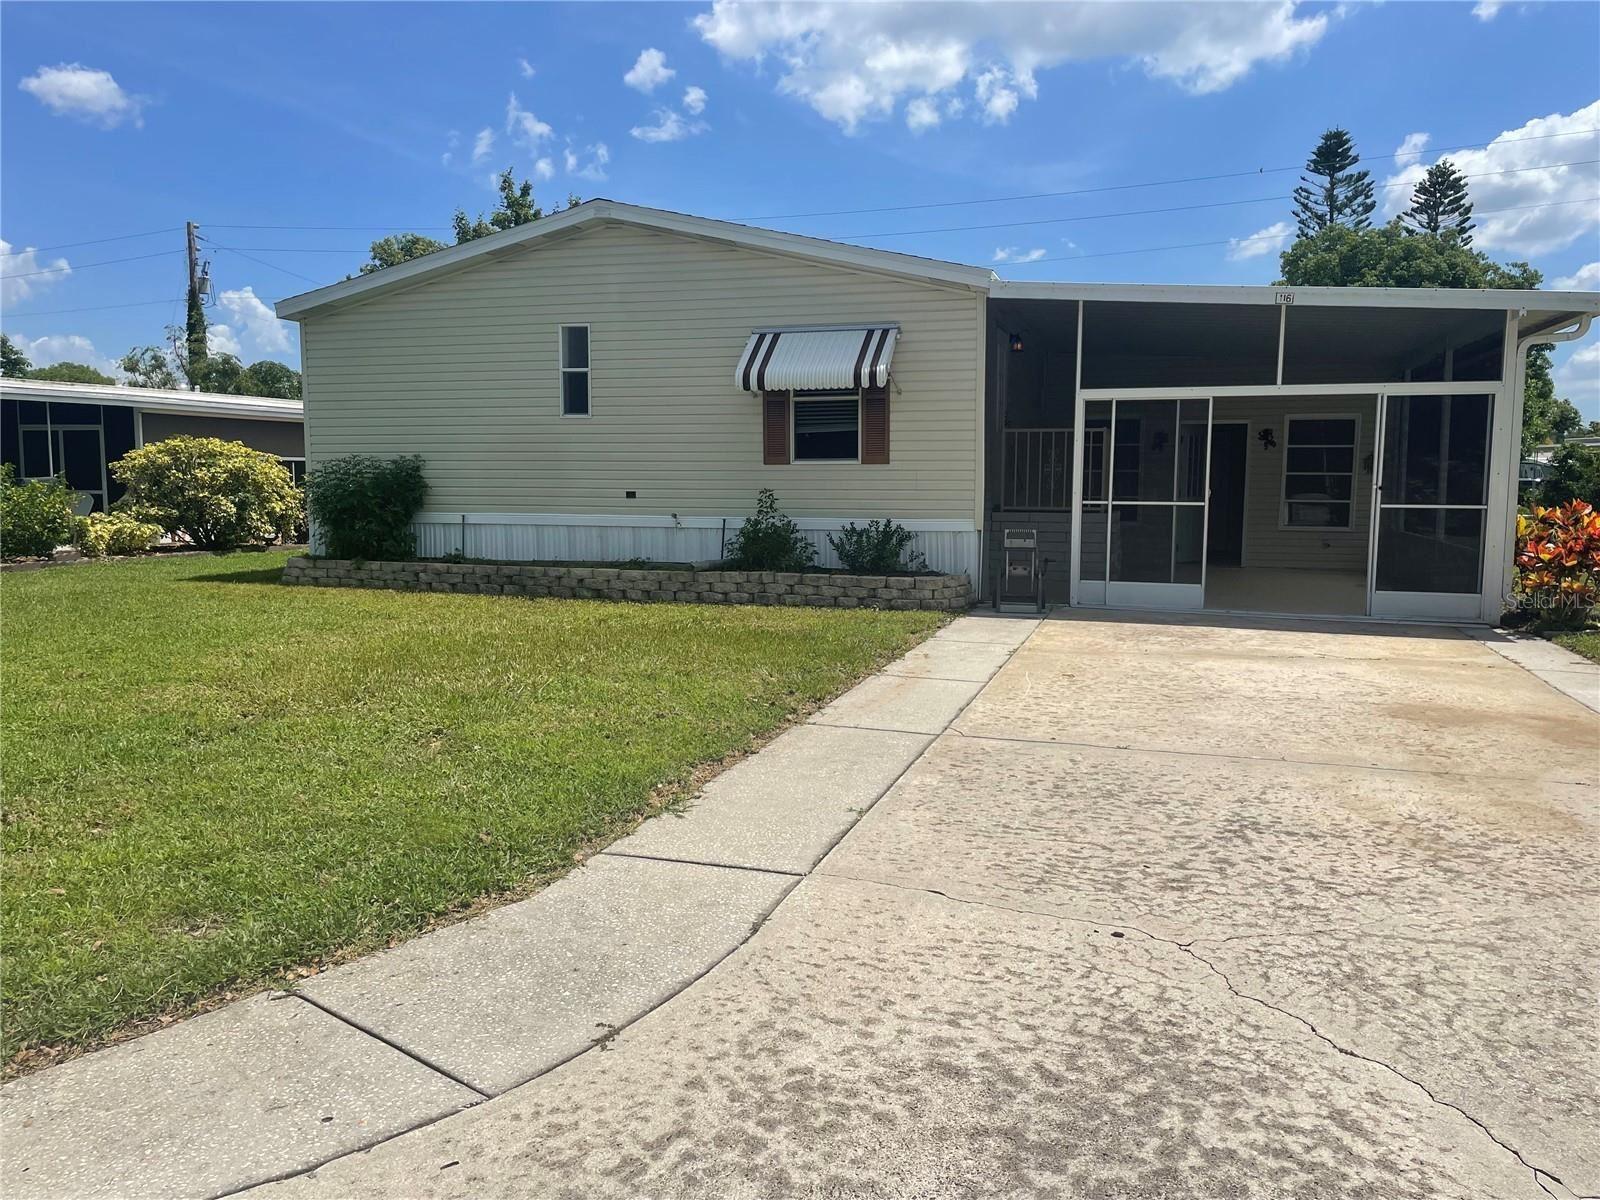 116 PHILADELPHIA BOULEVARD #8, Palm Harbor, FL 34684 - #: U8133508